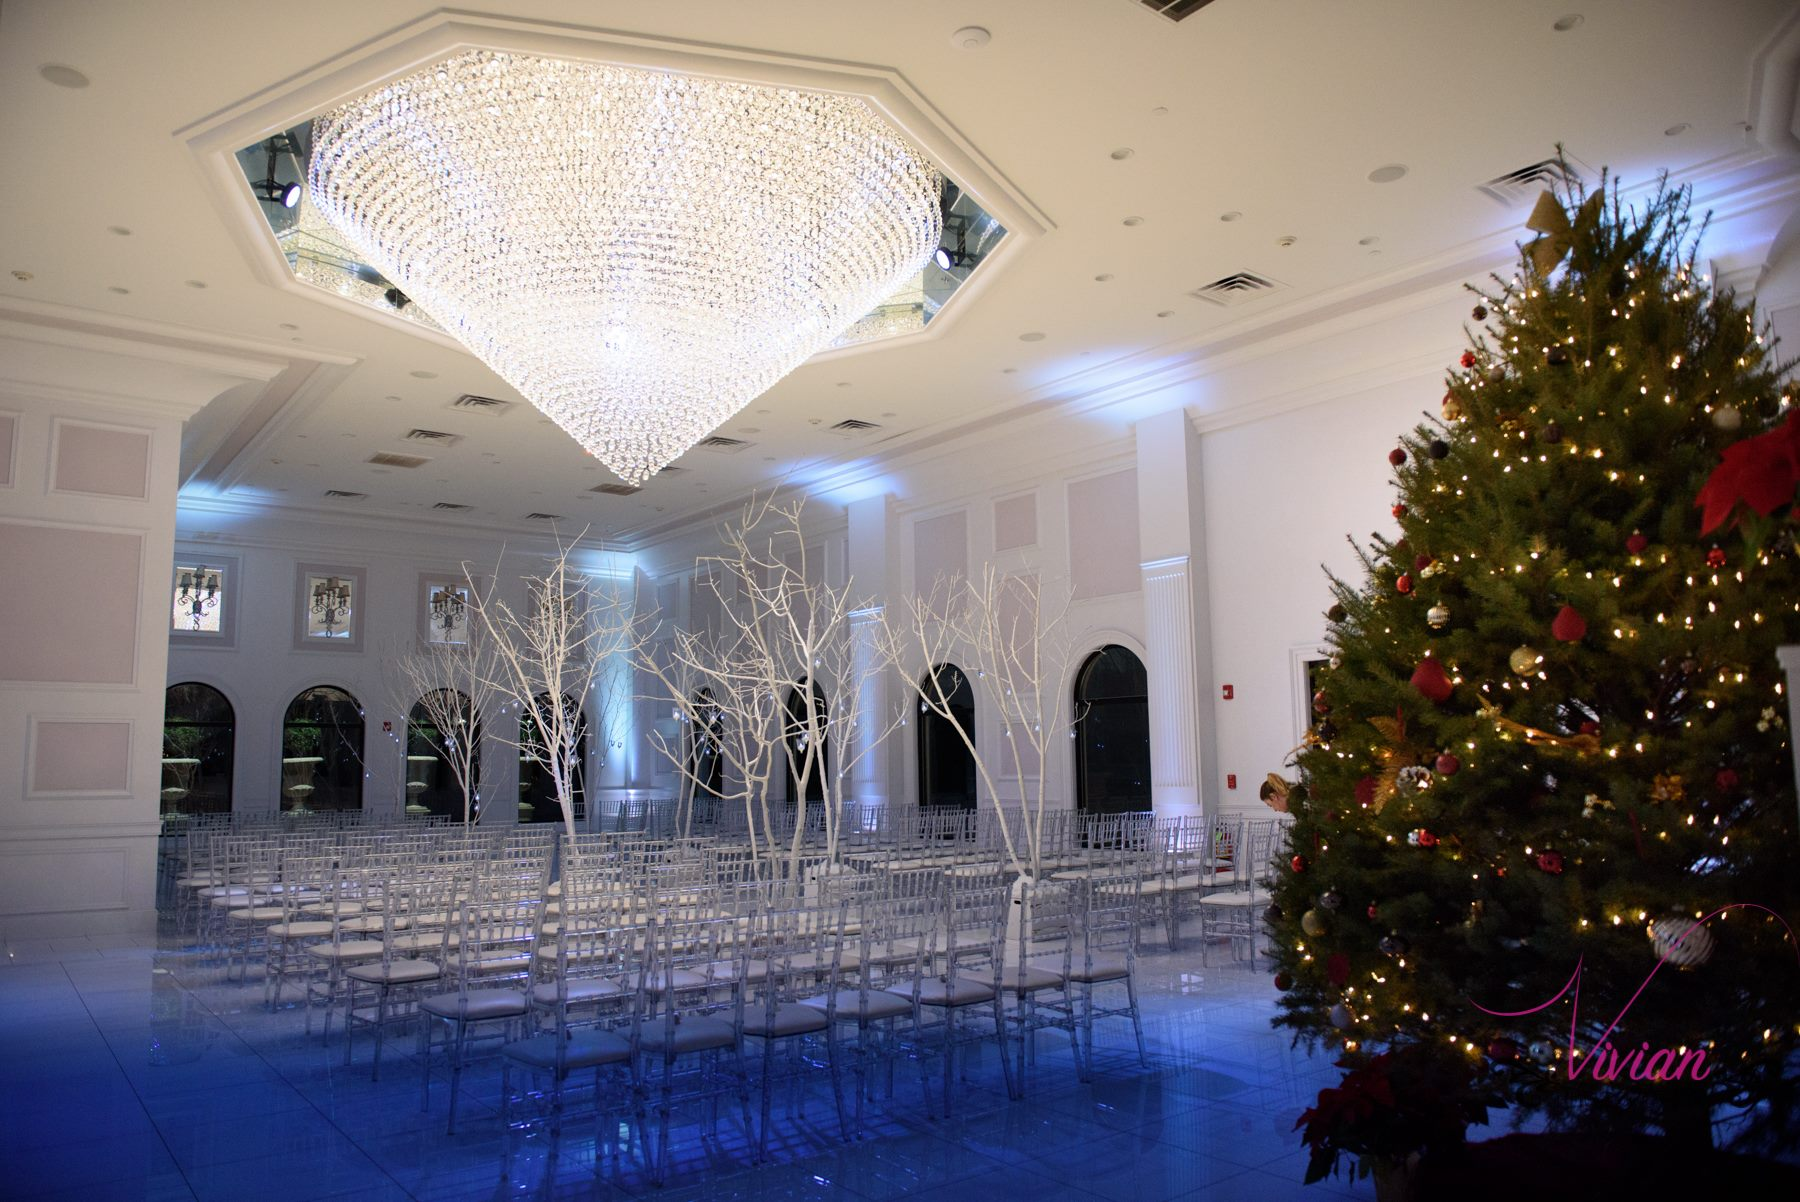 giant-chandelier-winter-wonderland-wedding-venue.jpg